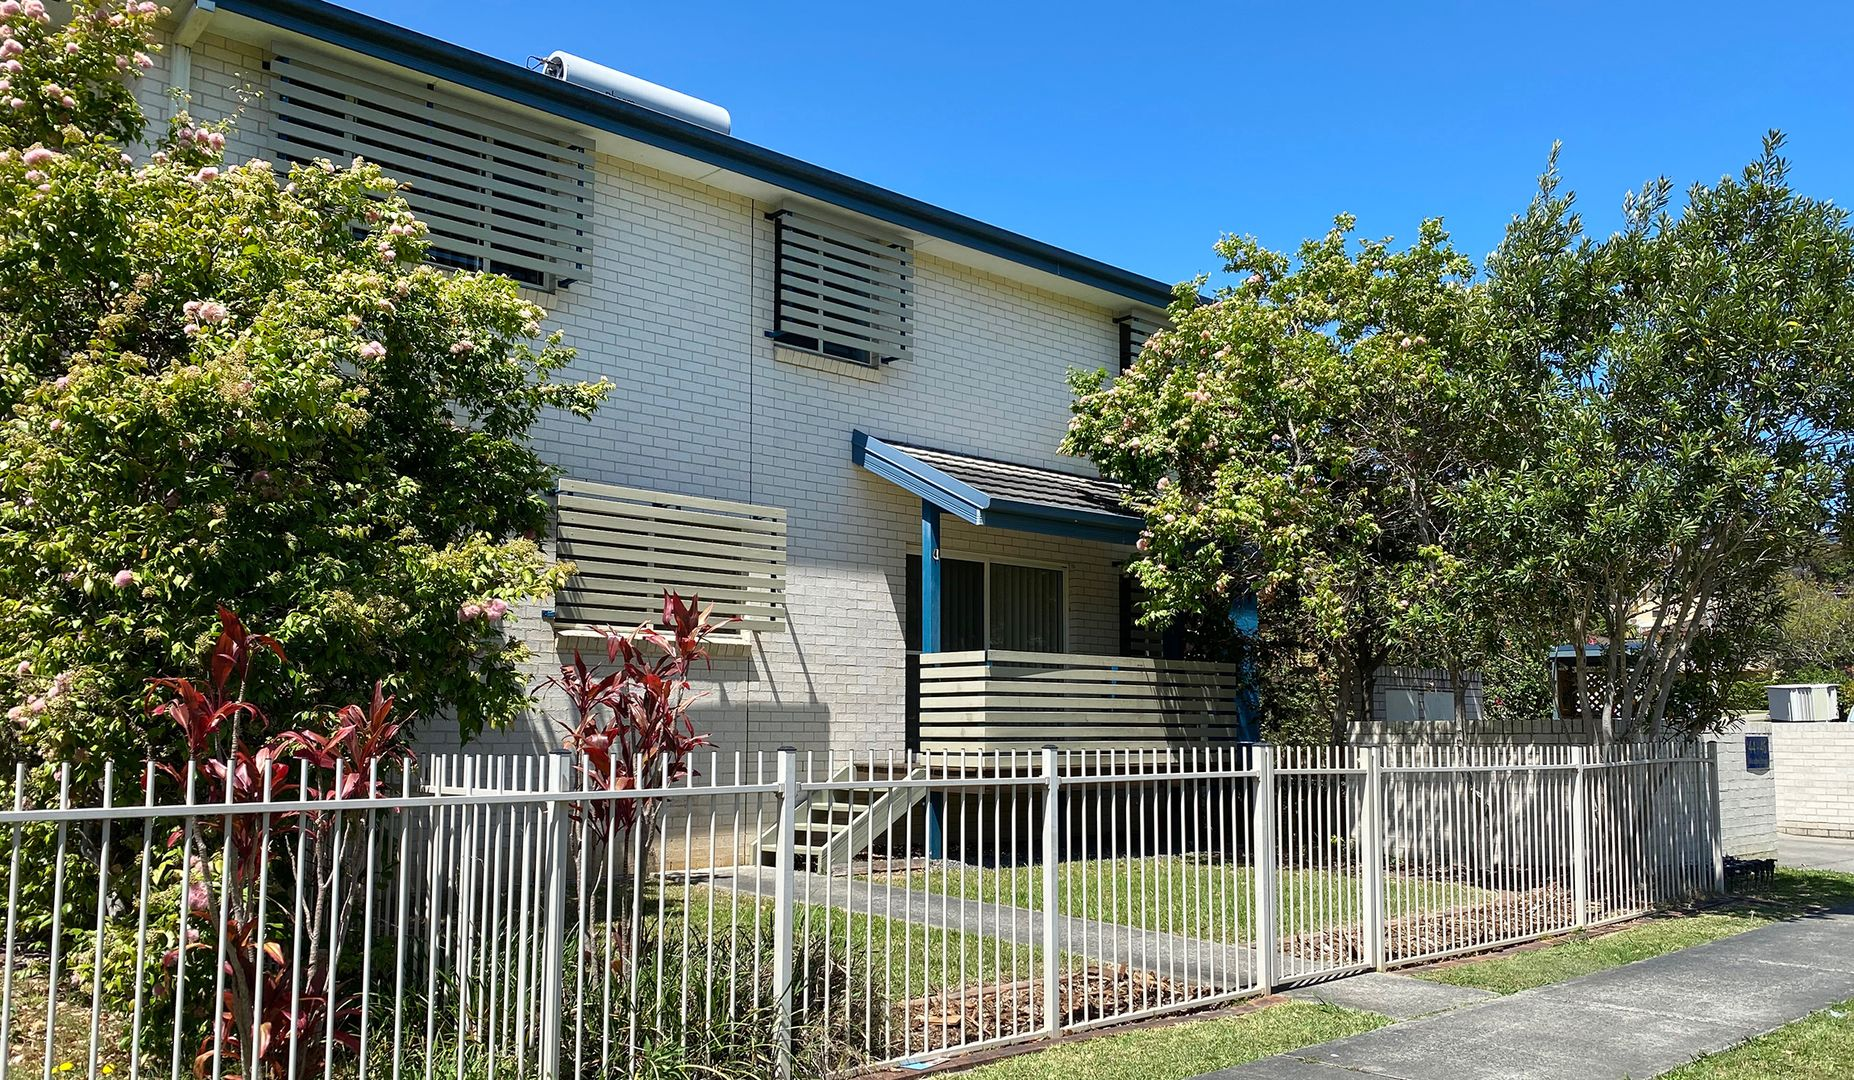 4/44 Meadow Street, Coffs Harbour NSW 2450, Image 0